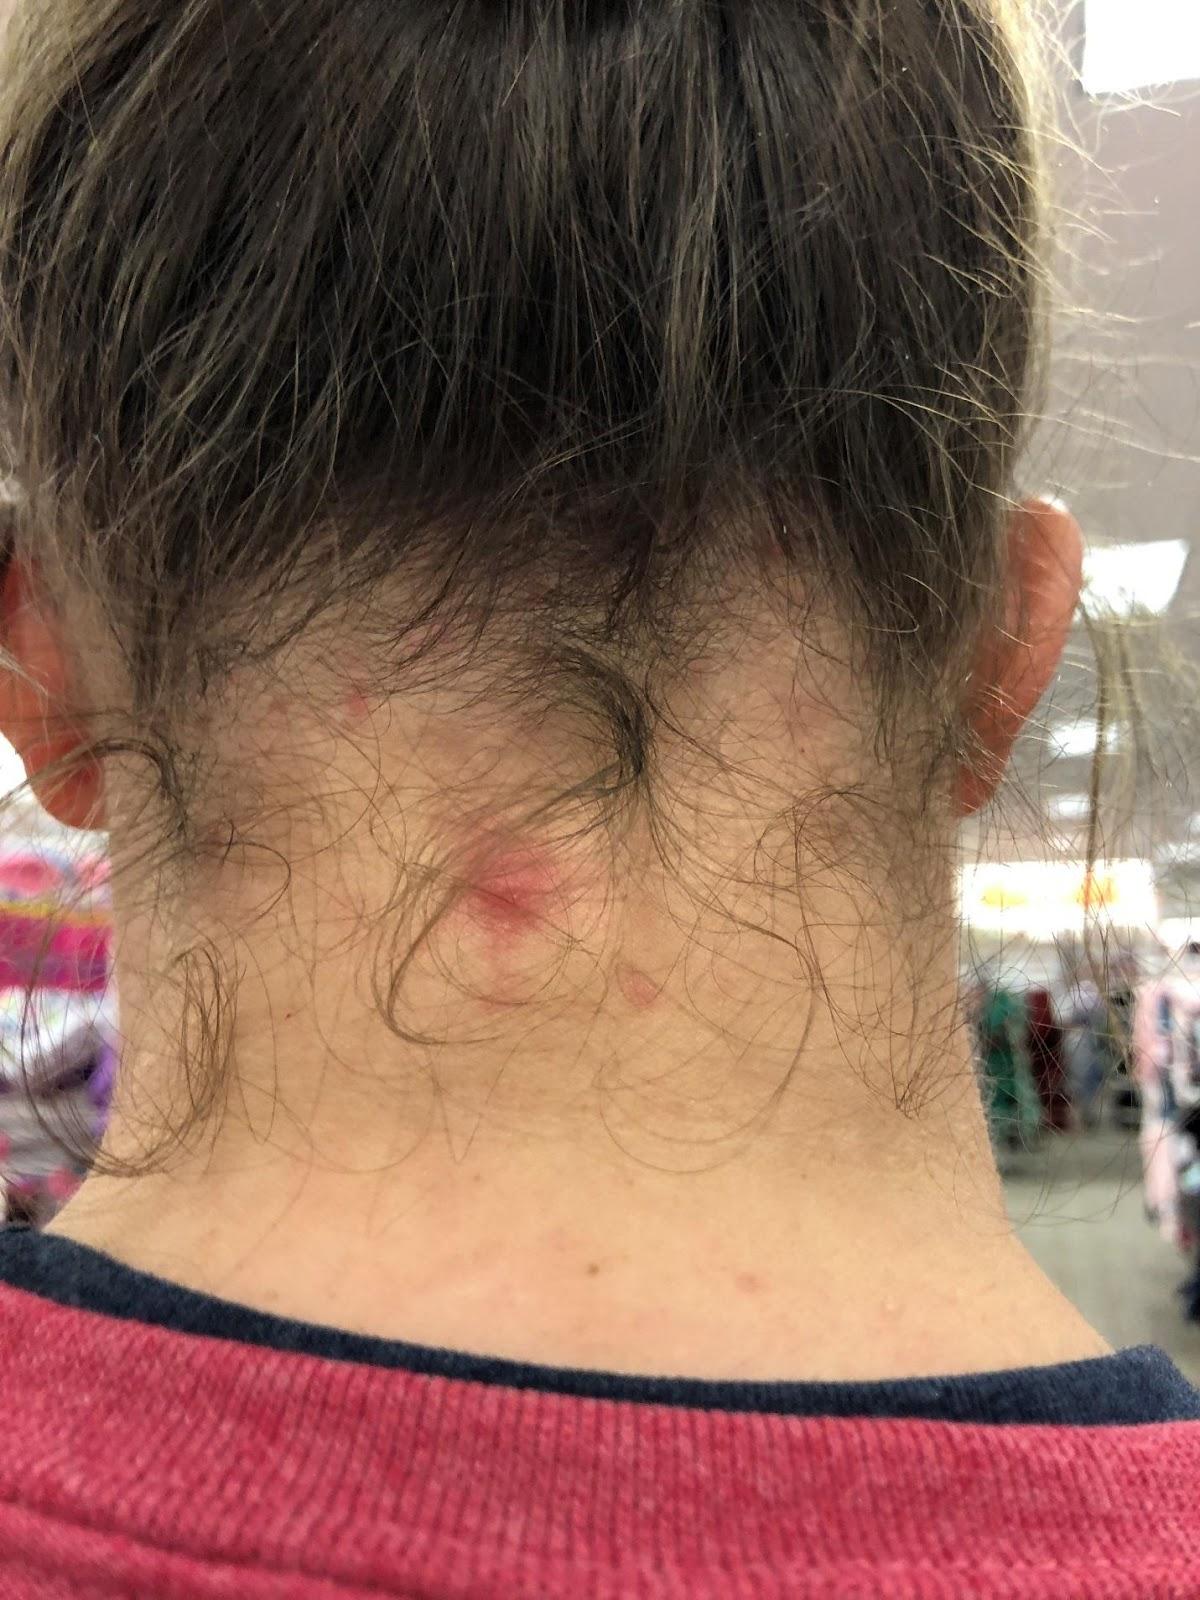 Symptoms of lice bites